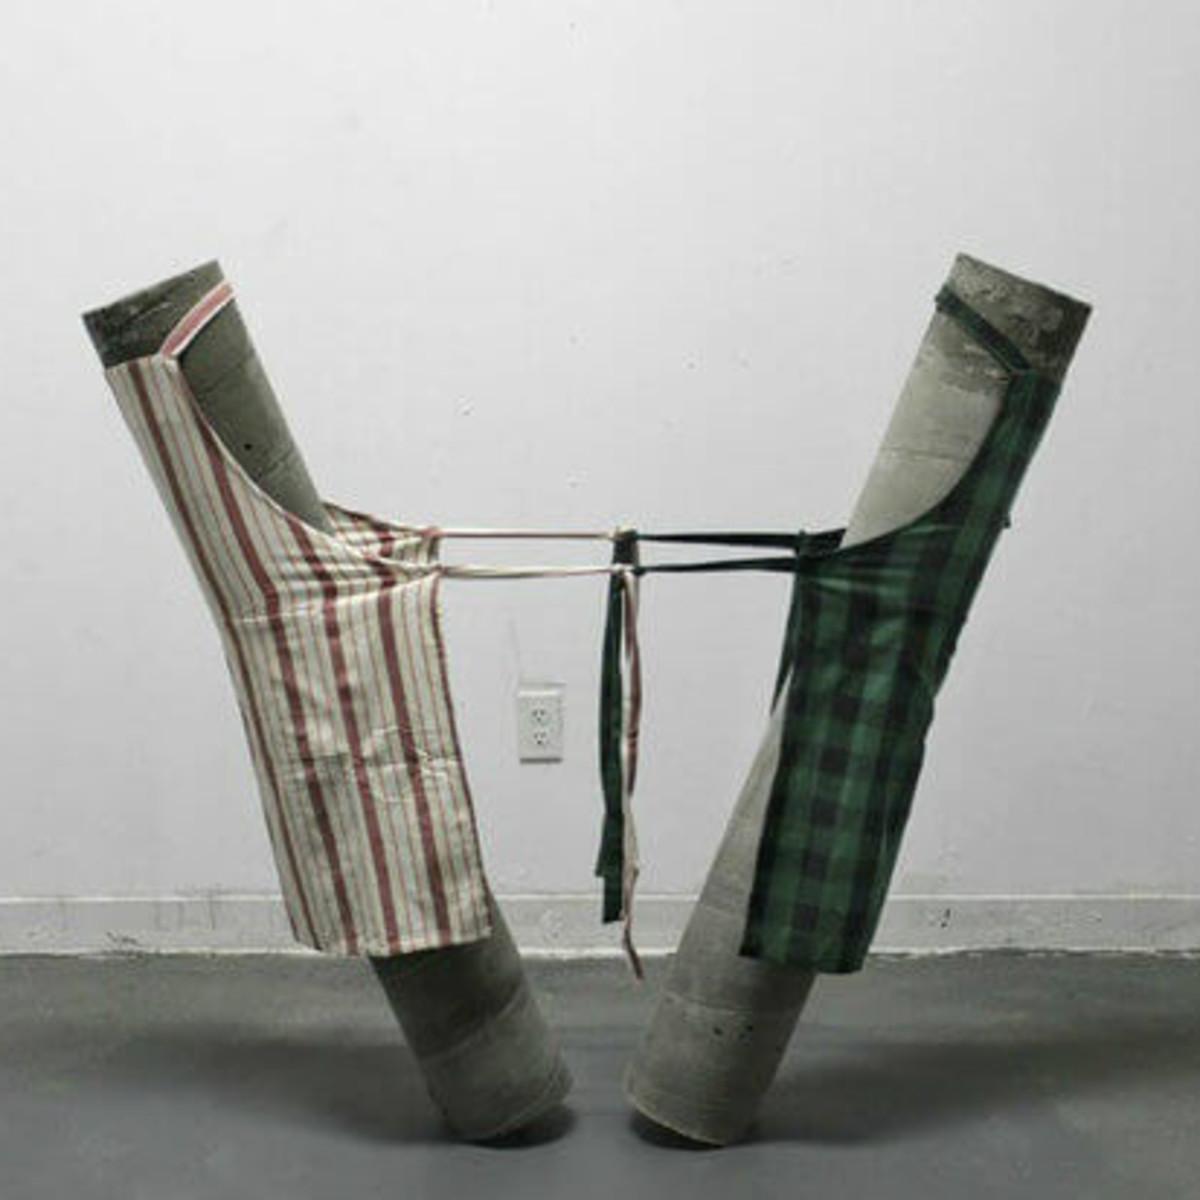 Sam Shoemaker